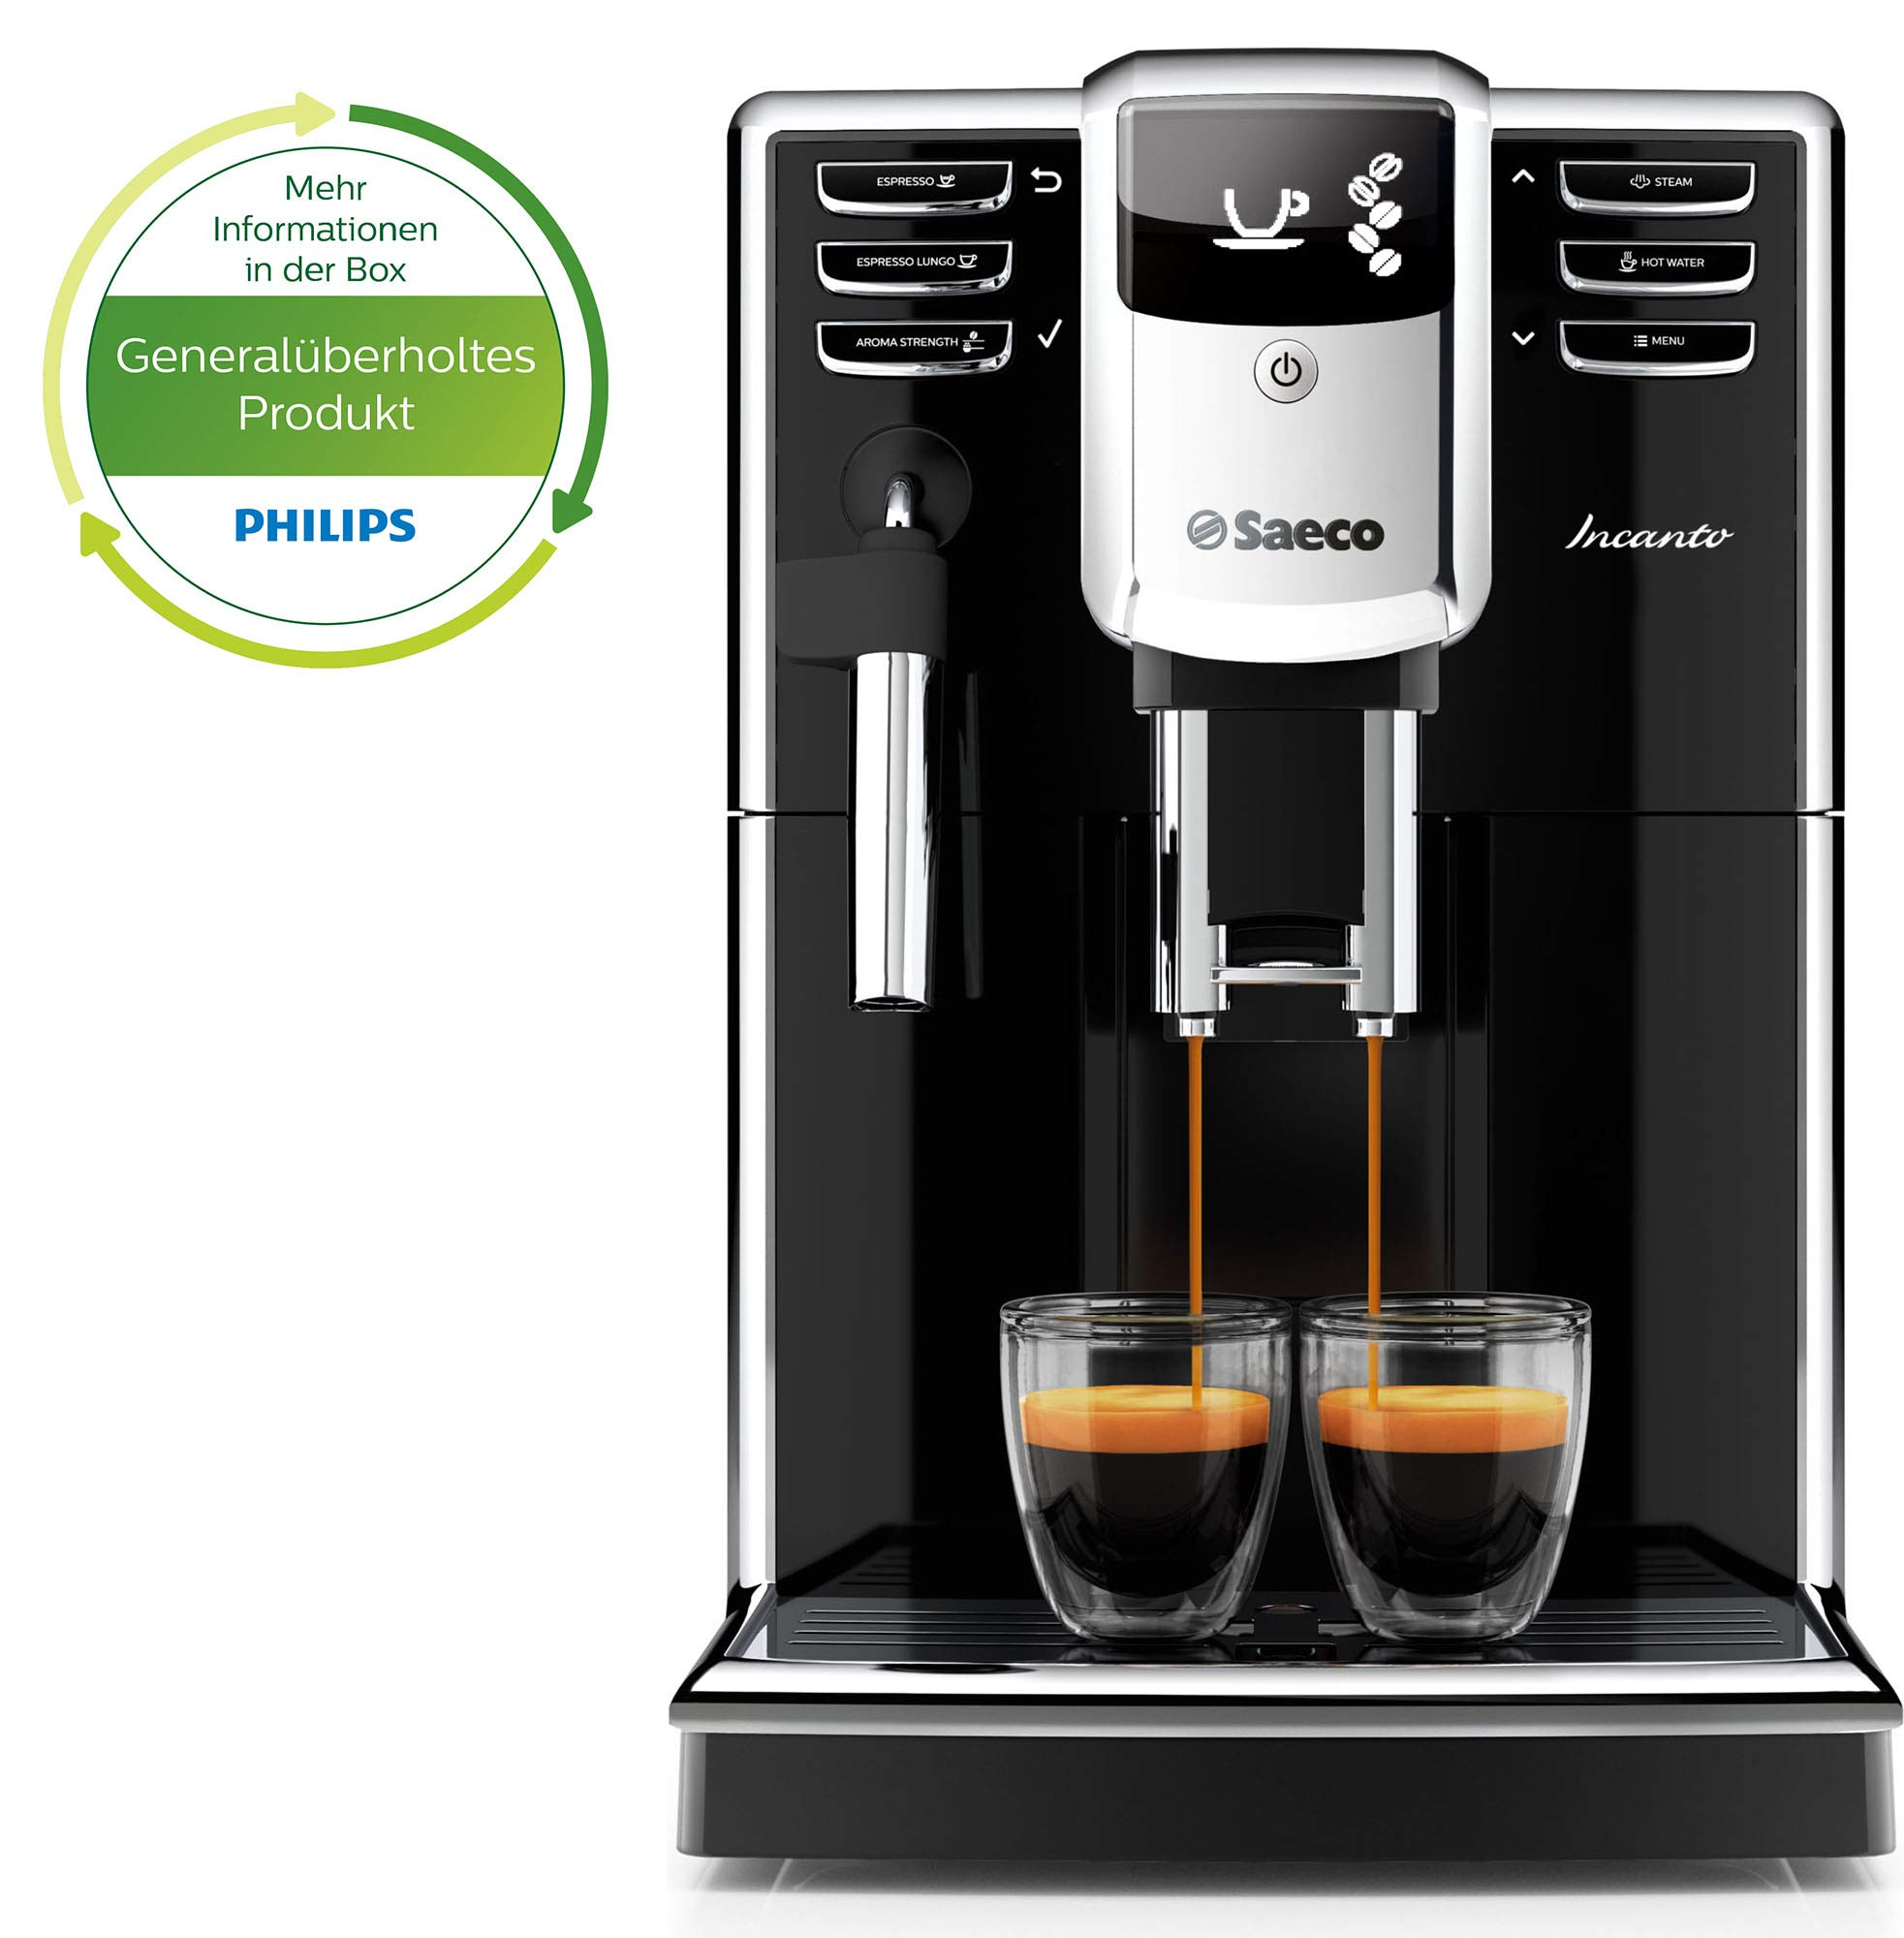 Saeco Incanto Cafetera HD8911/01 - Máquina de café espresso automática con pannarello, color negro: Amazon.es: Hogar